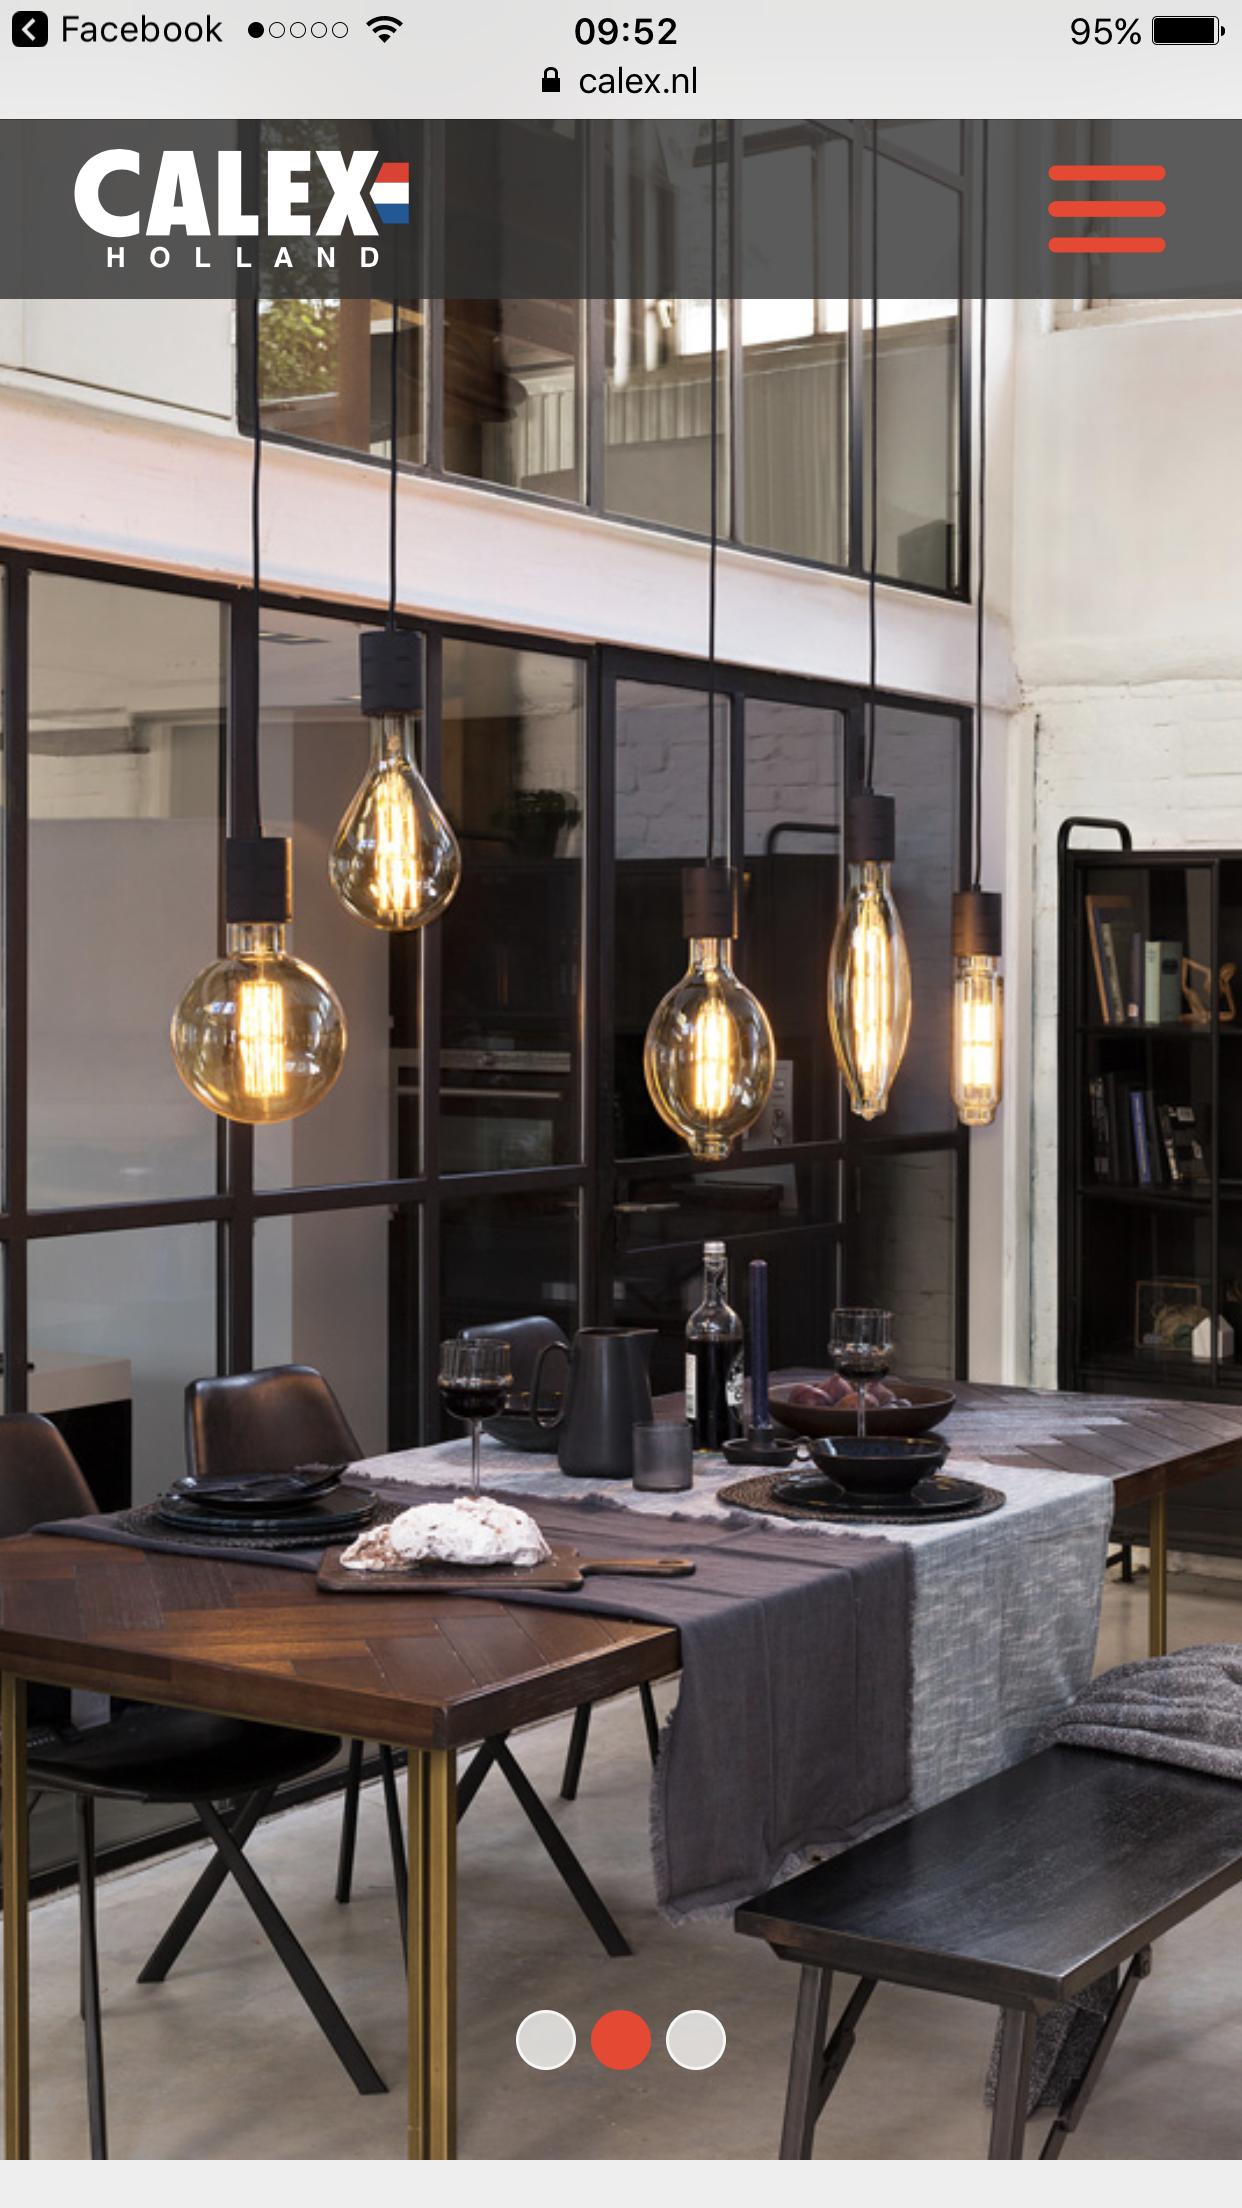 Calex Giant LED lamps  saai op deze manier  Eetkamer in